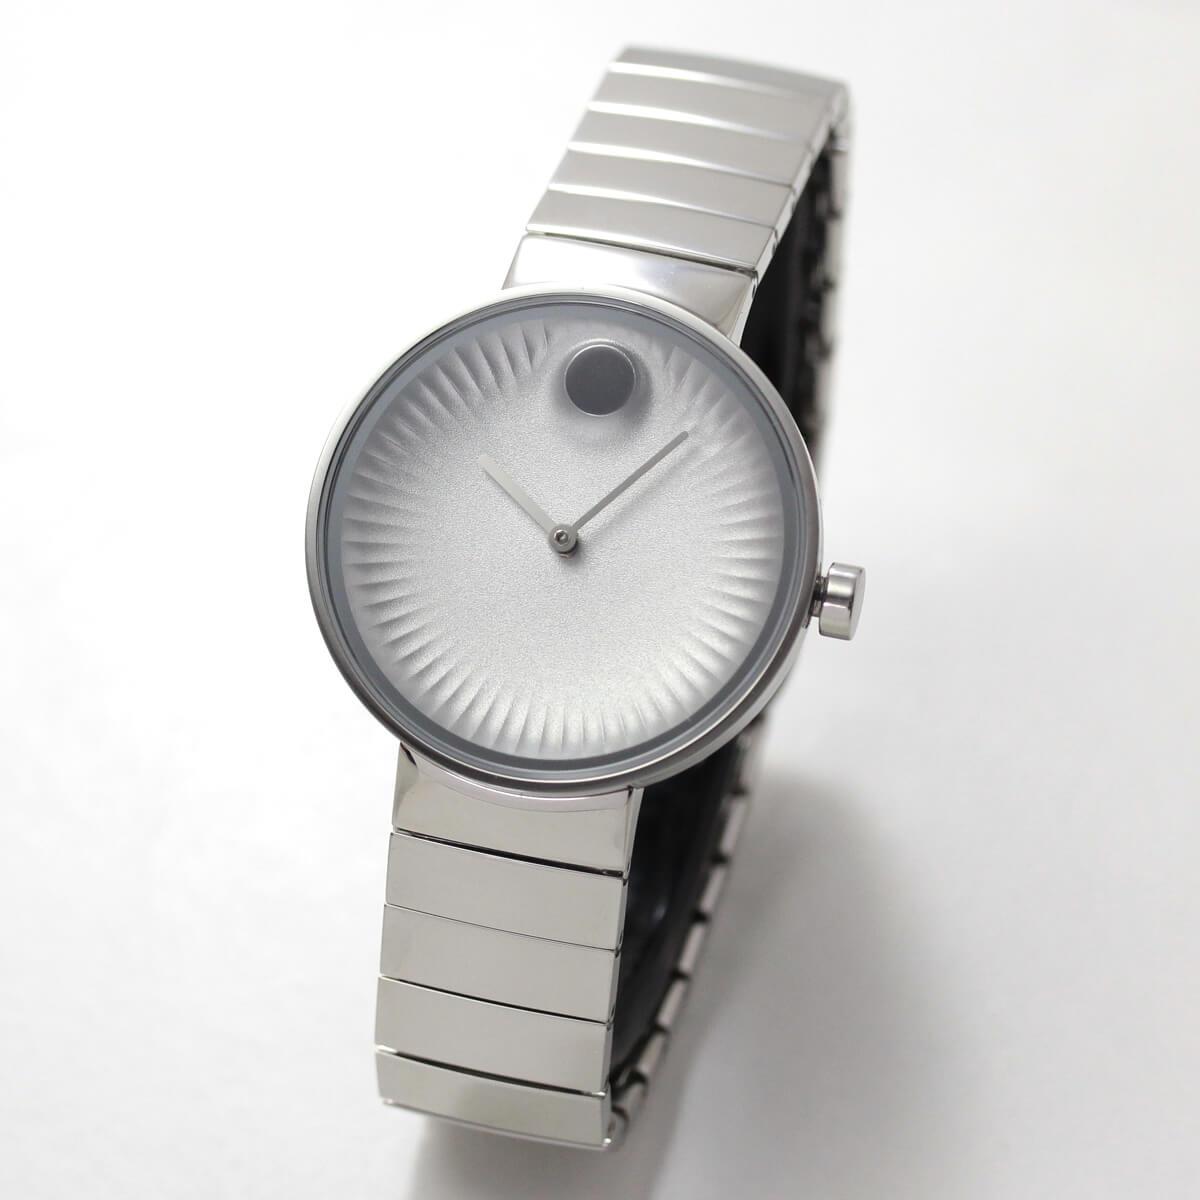 MOVADO EDGE モバード エッジ スイスブランドの腕時計 e36800128105s